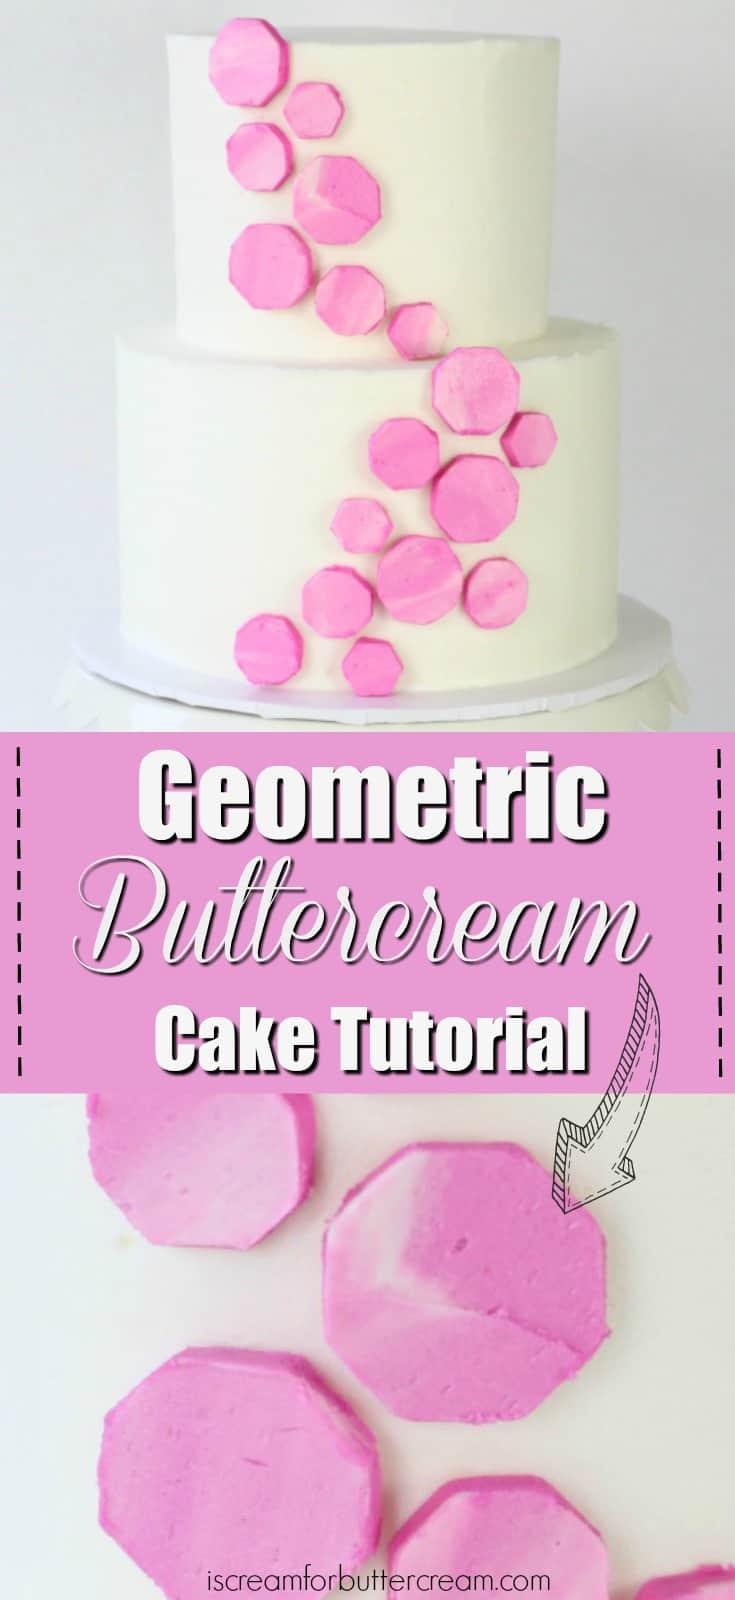 Geometric Buttercream Cake Pinterest Graphic